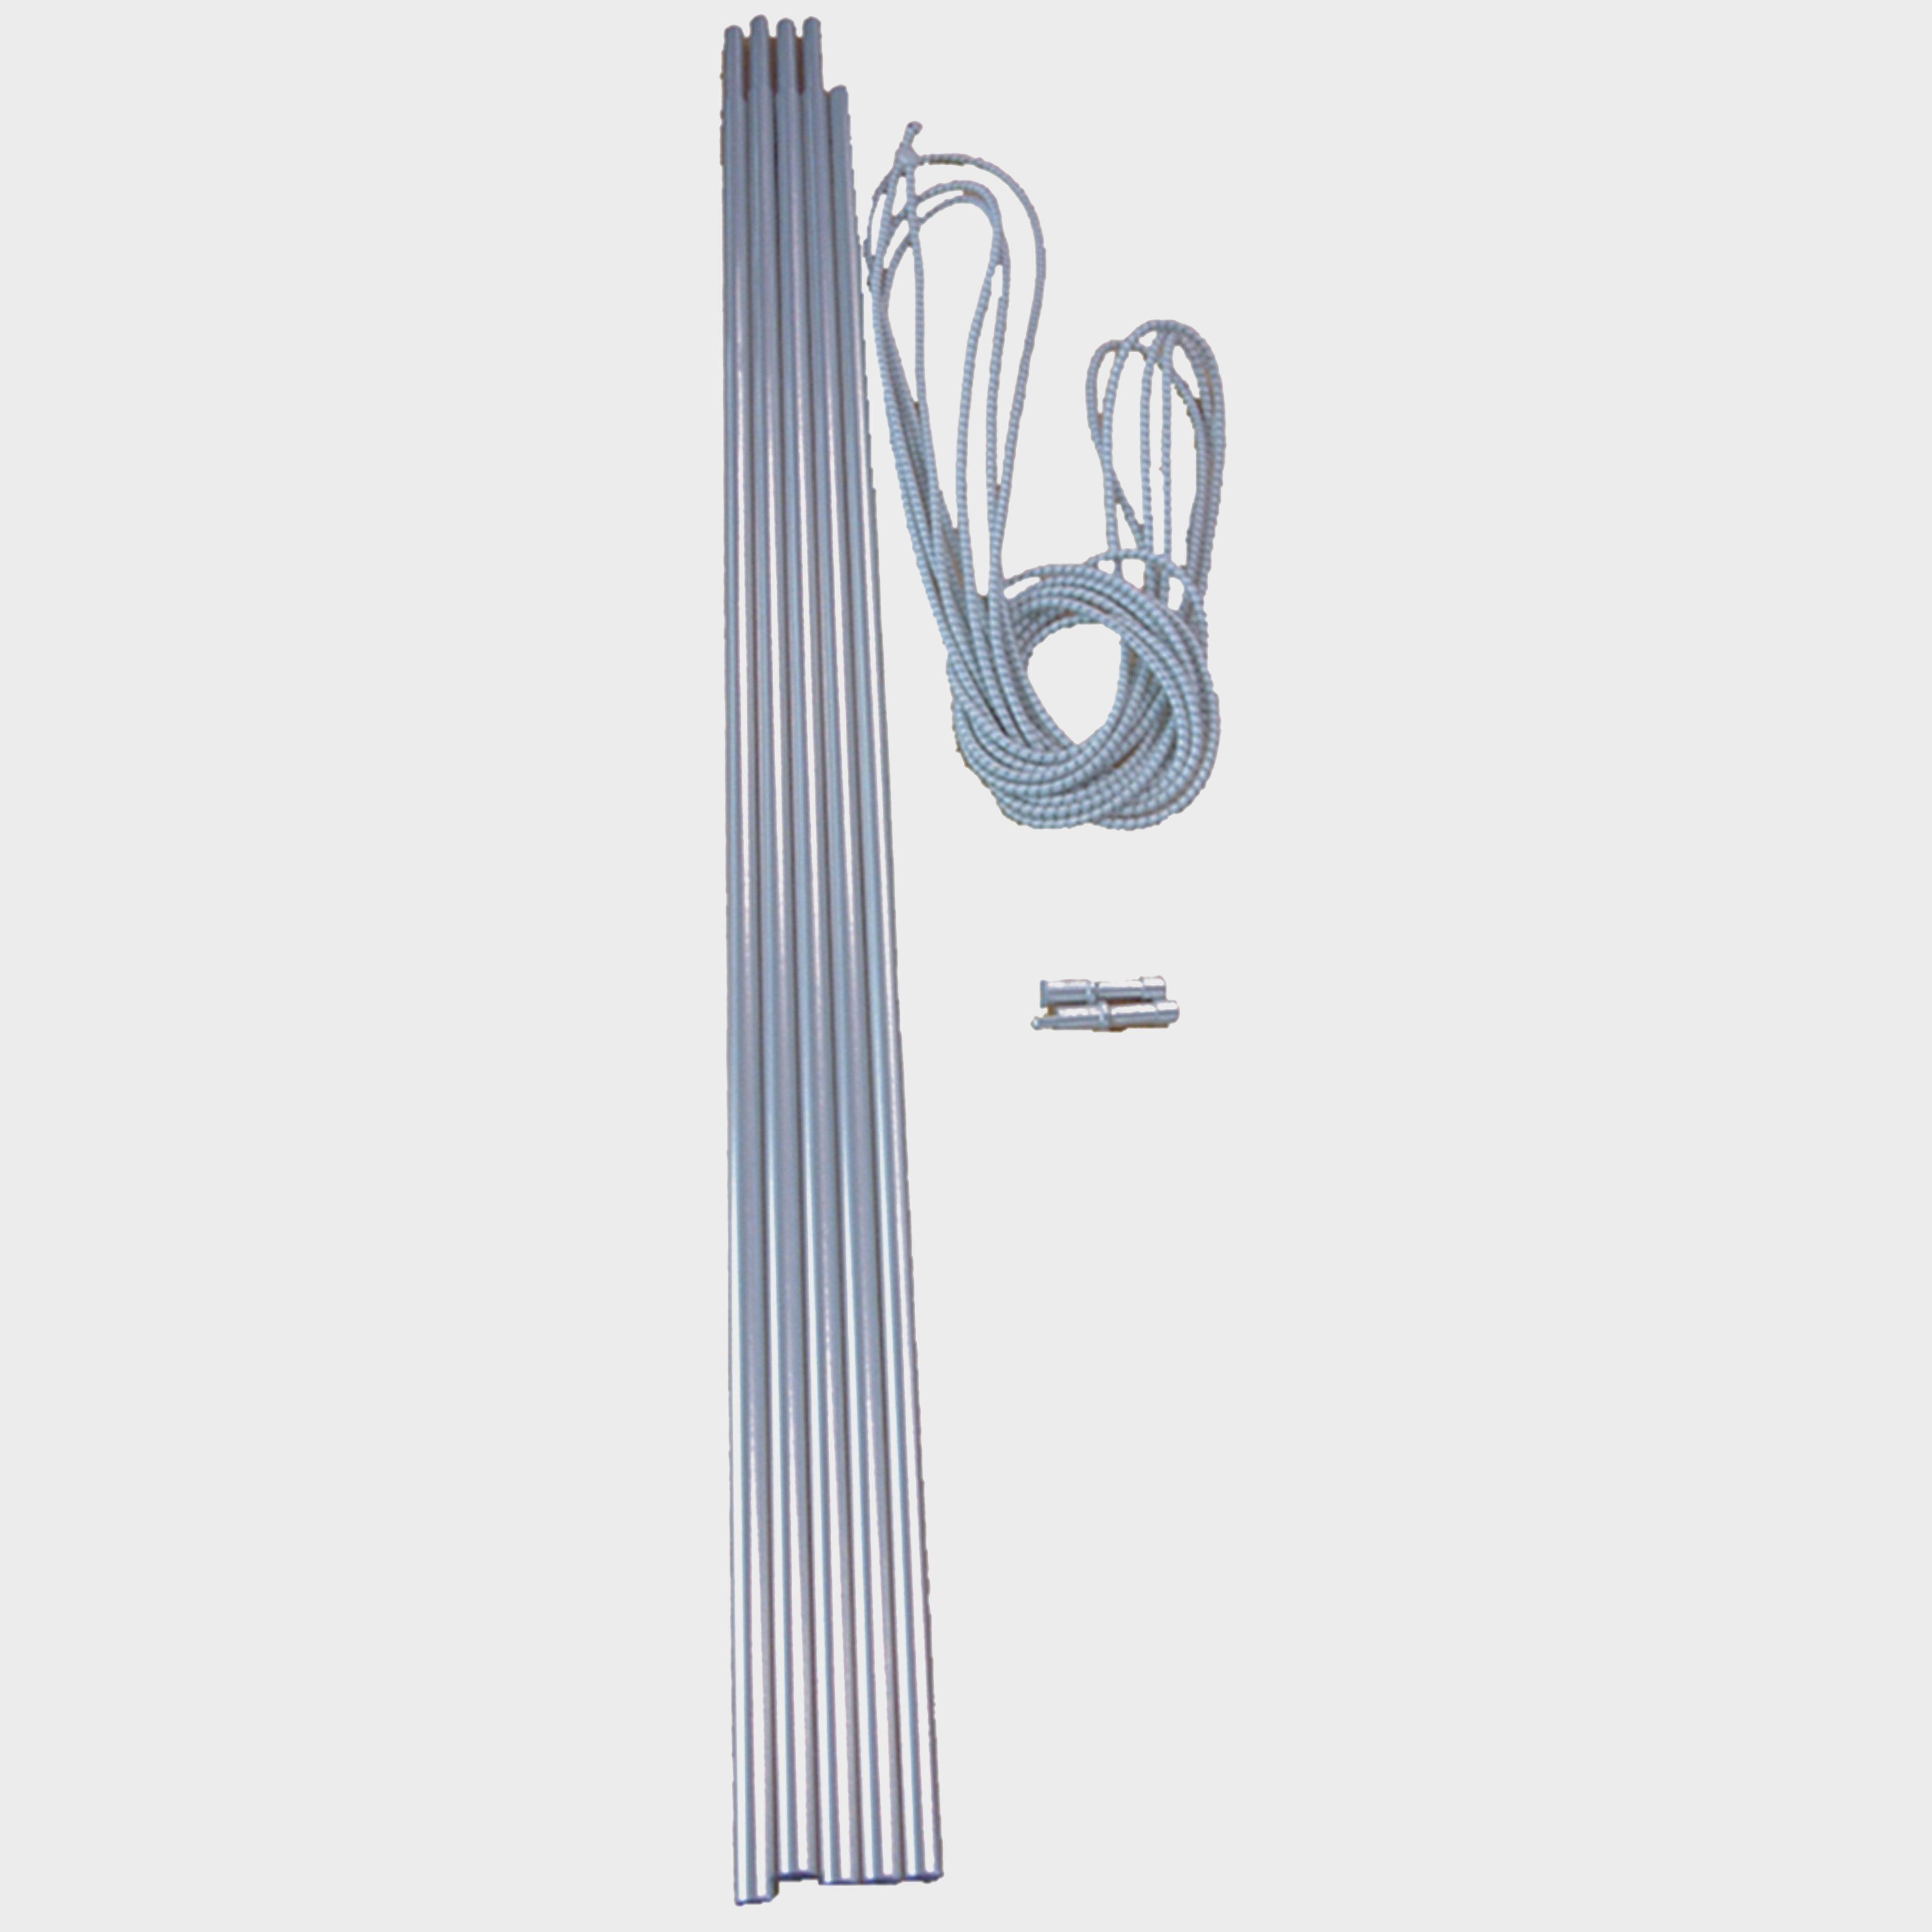 Vango Alloy Corded 9.5mm Tent Pole Set Silver